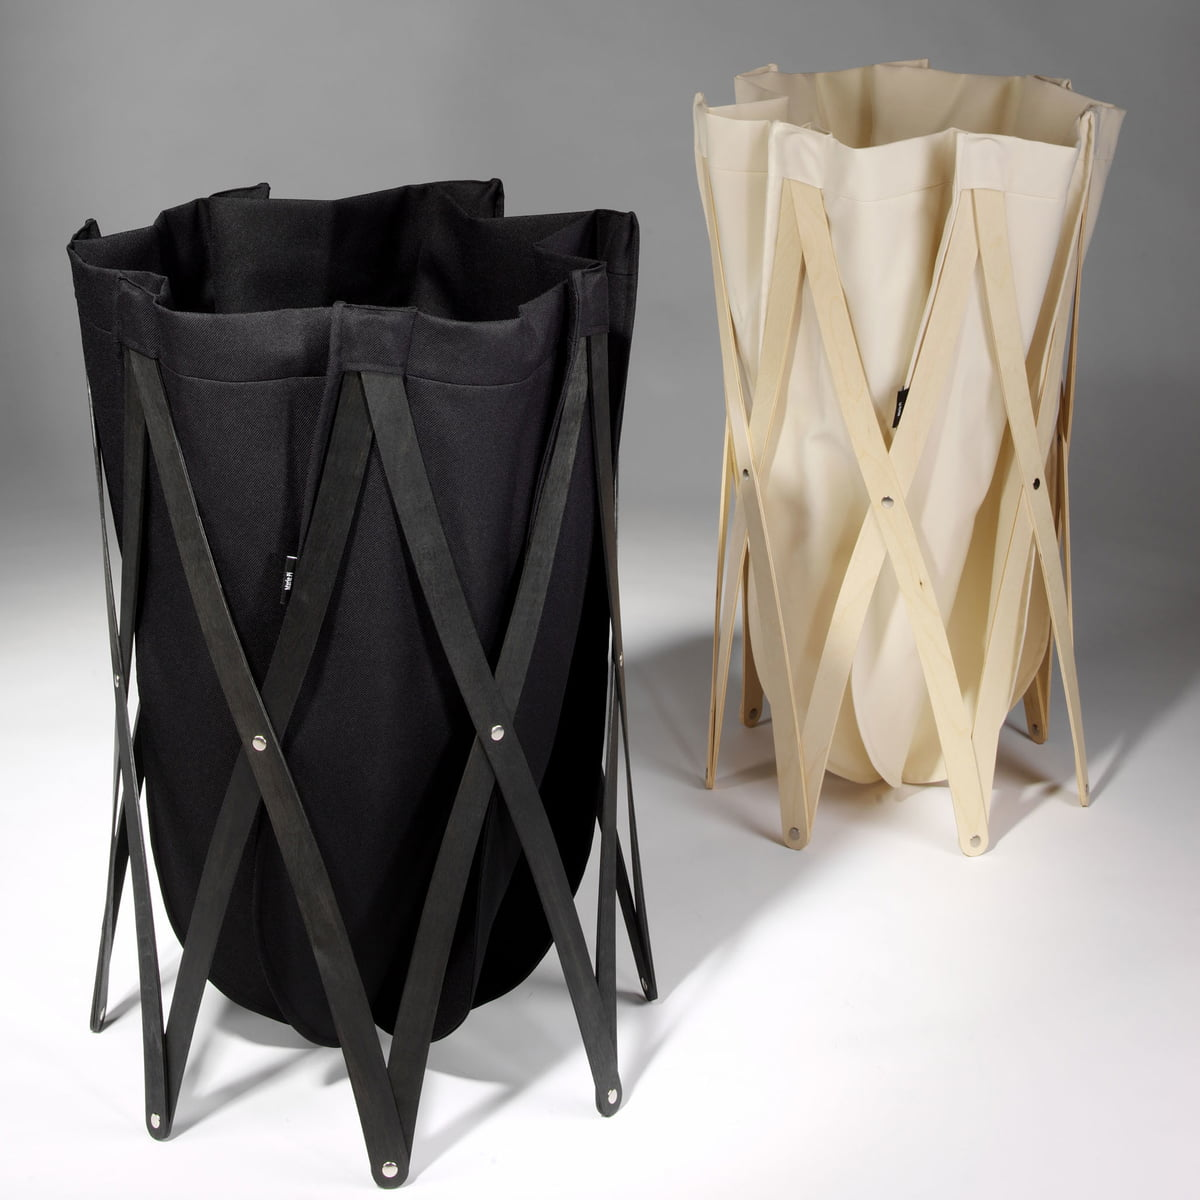 marie pi w schekorb klein more shop. Black Bedroom Furniture Sets. Home Design Ideas